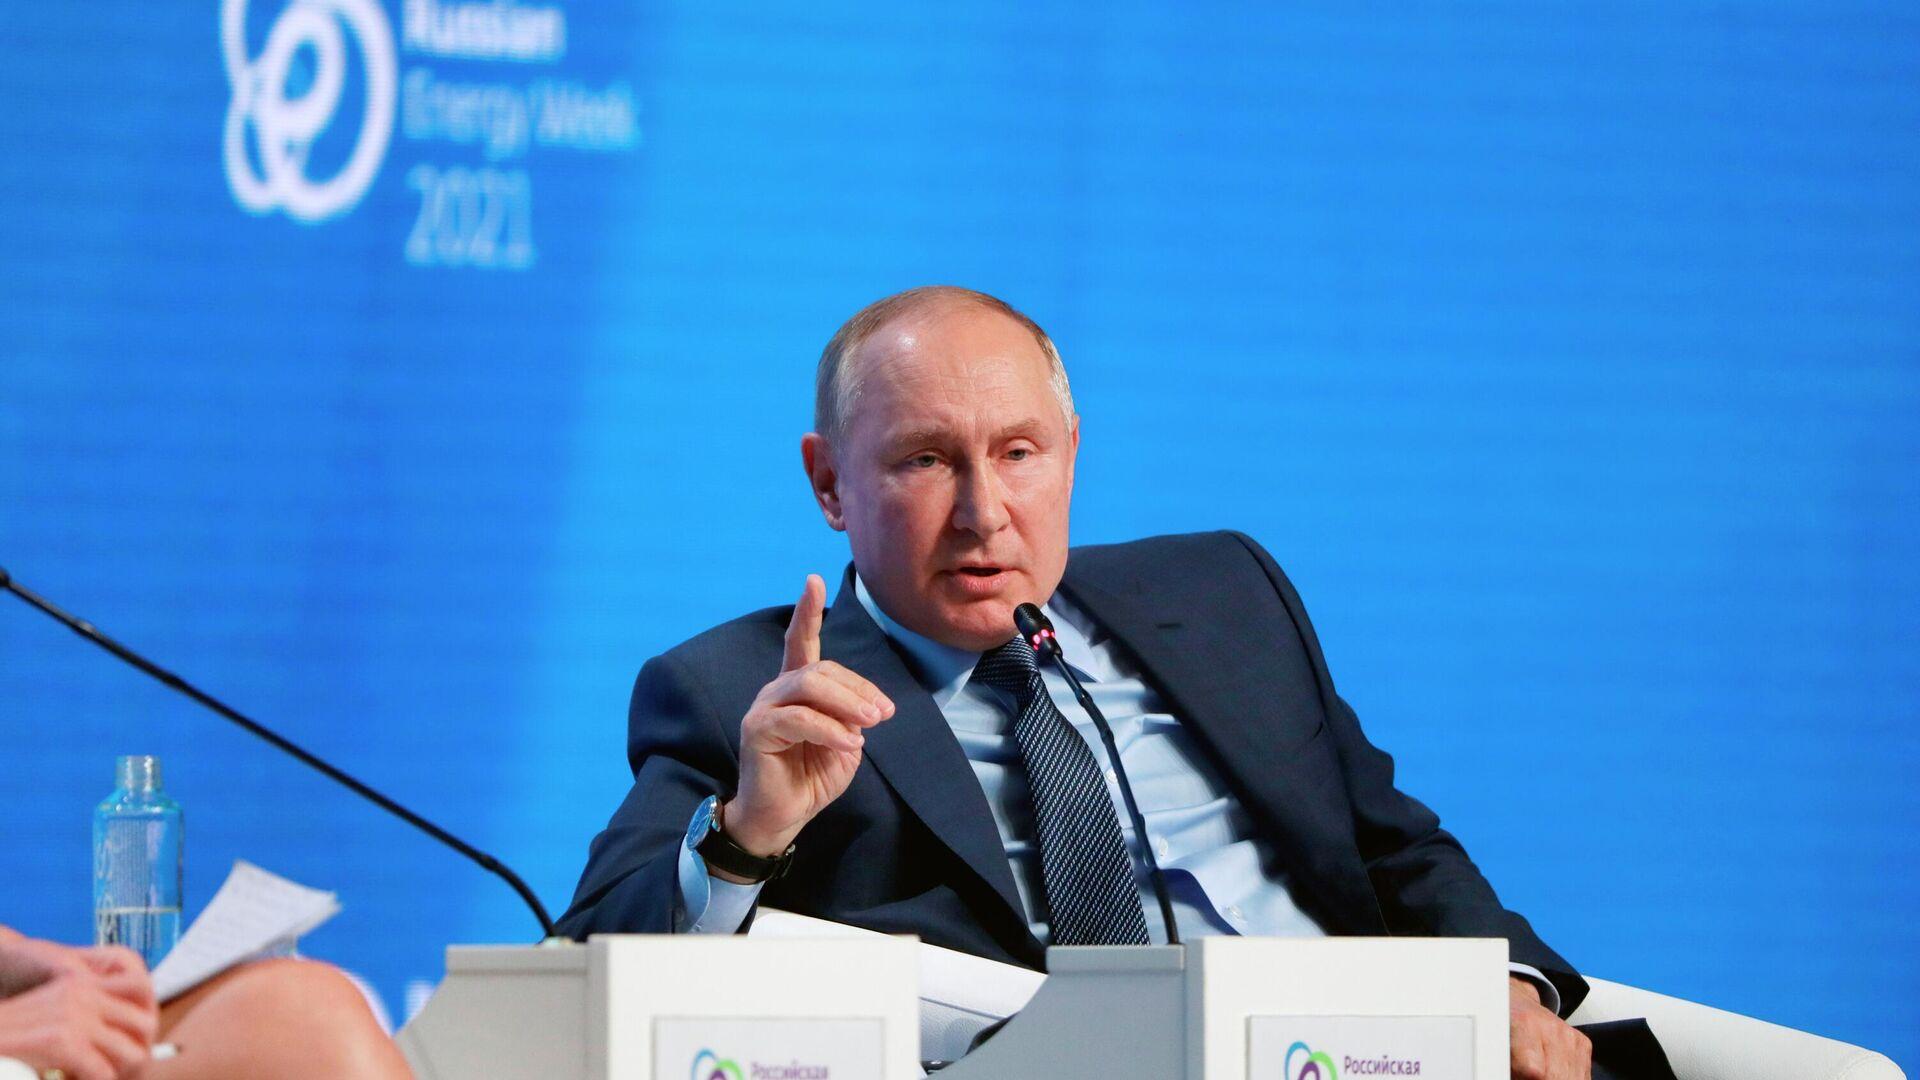 Predsednik Rusije Vladimir Putin - Sputnik Srbija, 1920, 14.10.2021